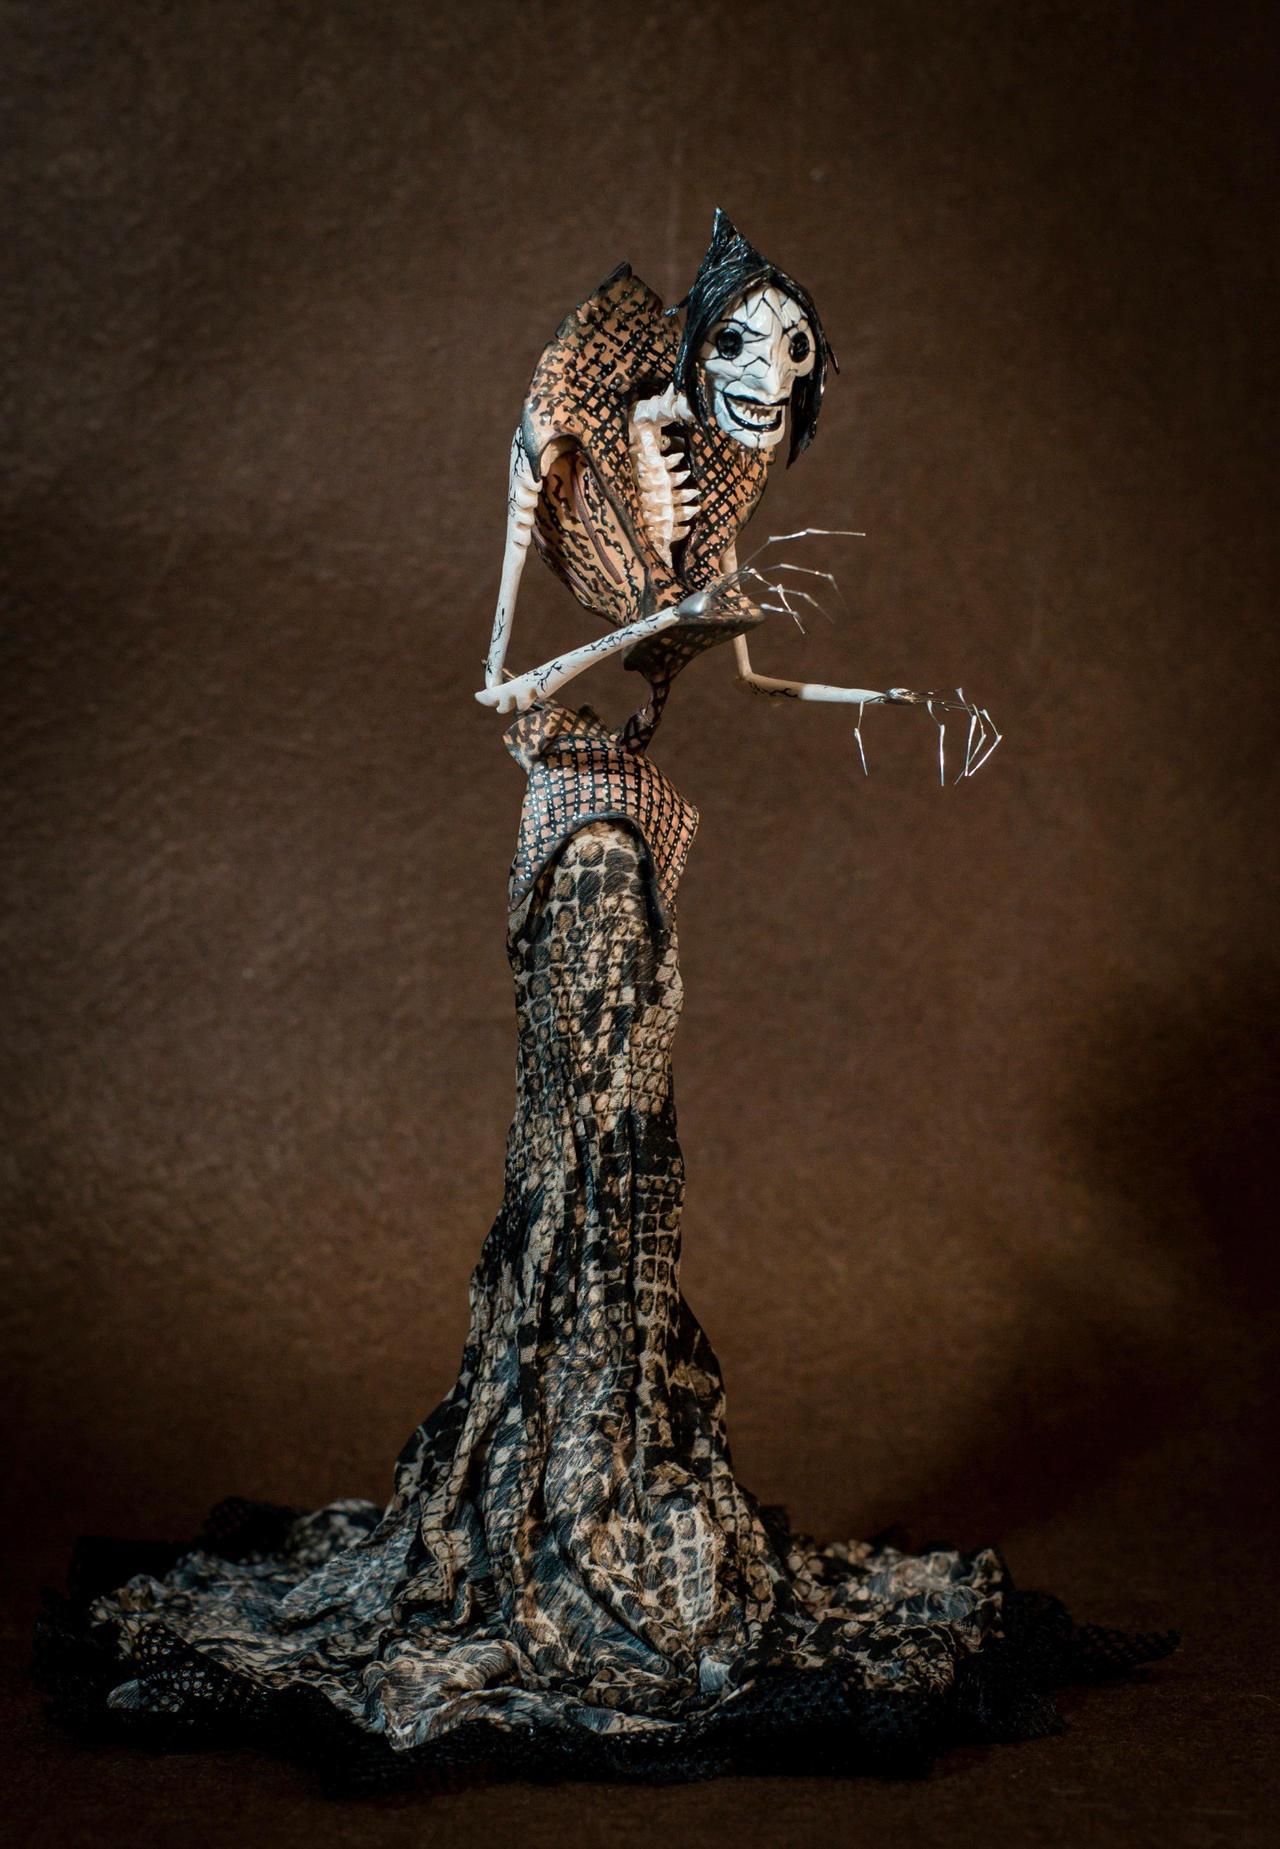 Other Mother Coraline By Vint1k On Deviantart